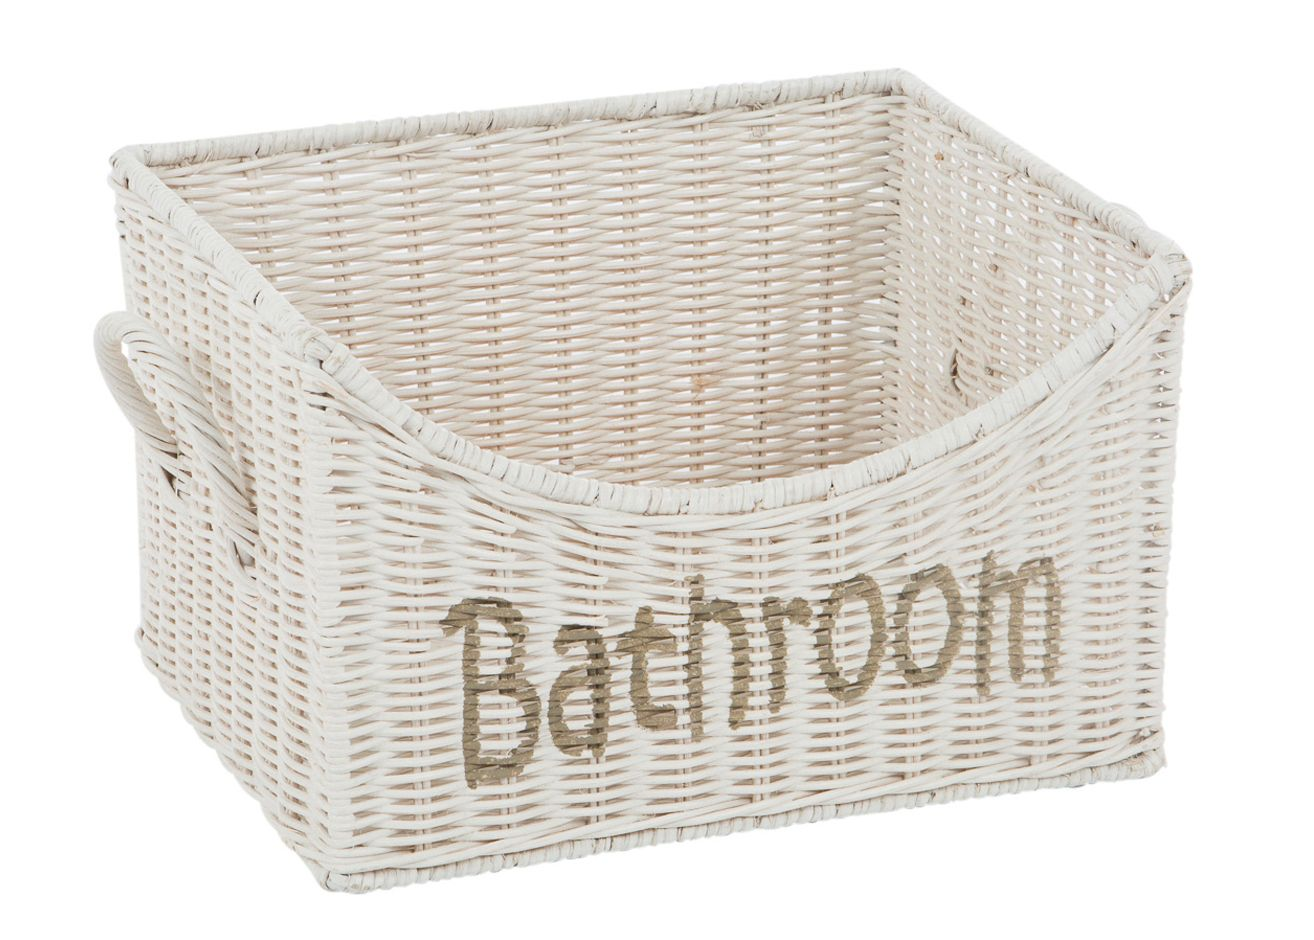 Rieten badkamer mand wit - Badkamermanden